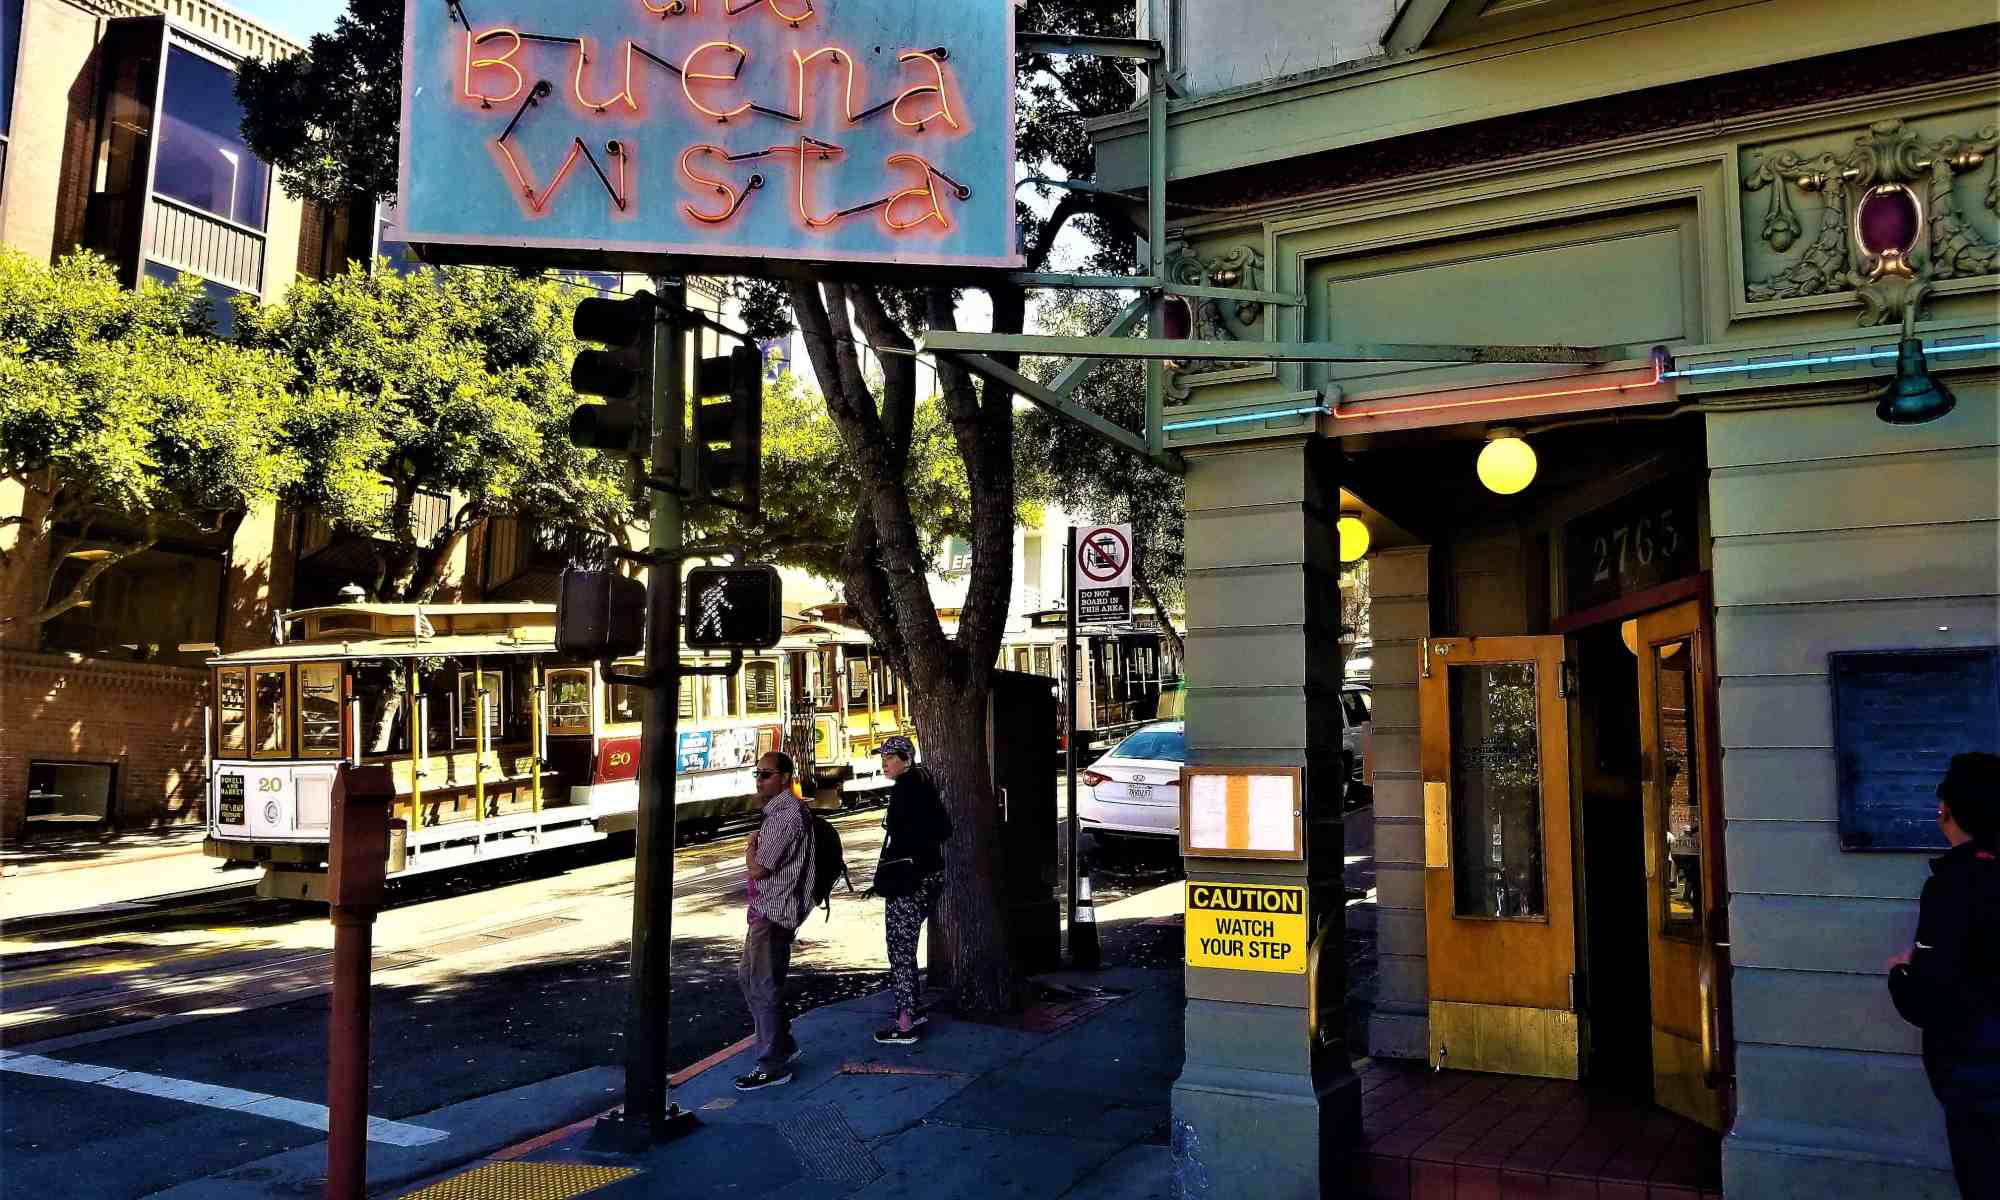 image-of-san-francisco-cafe-buena-vista-exterior